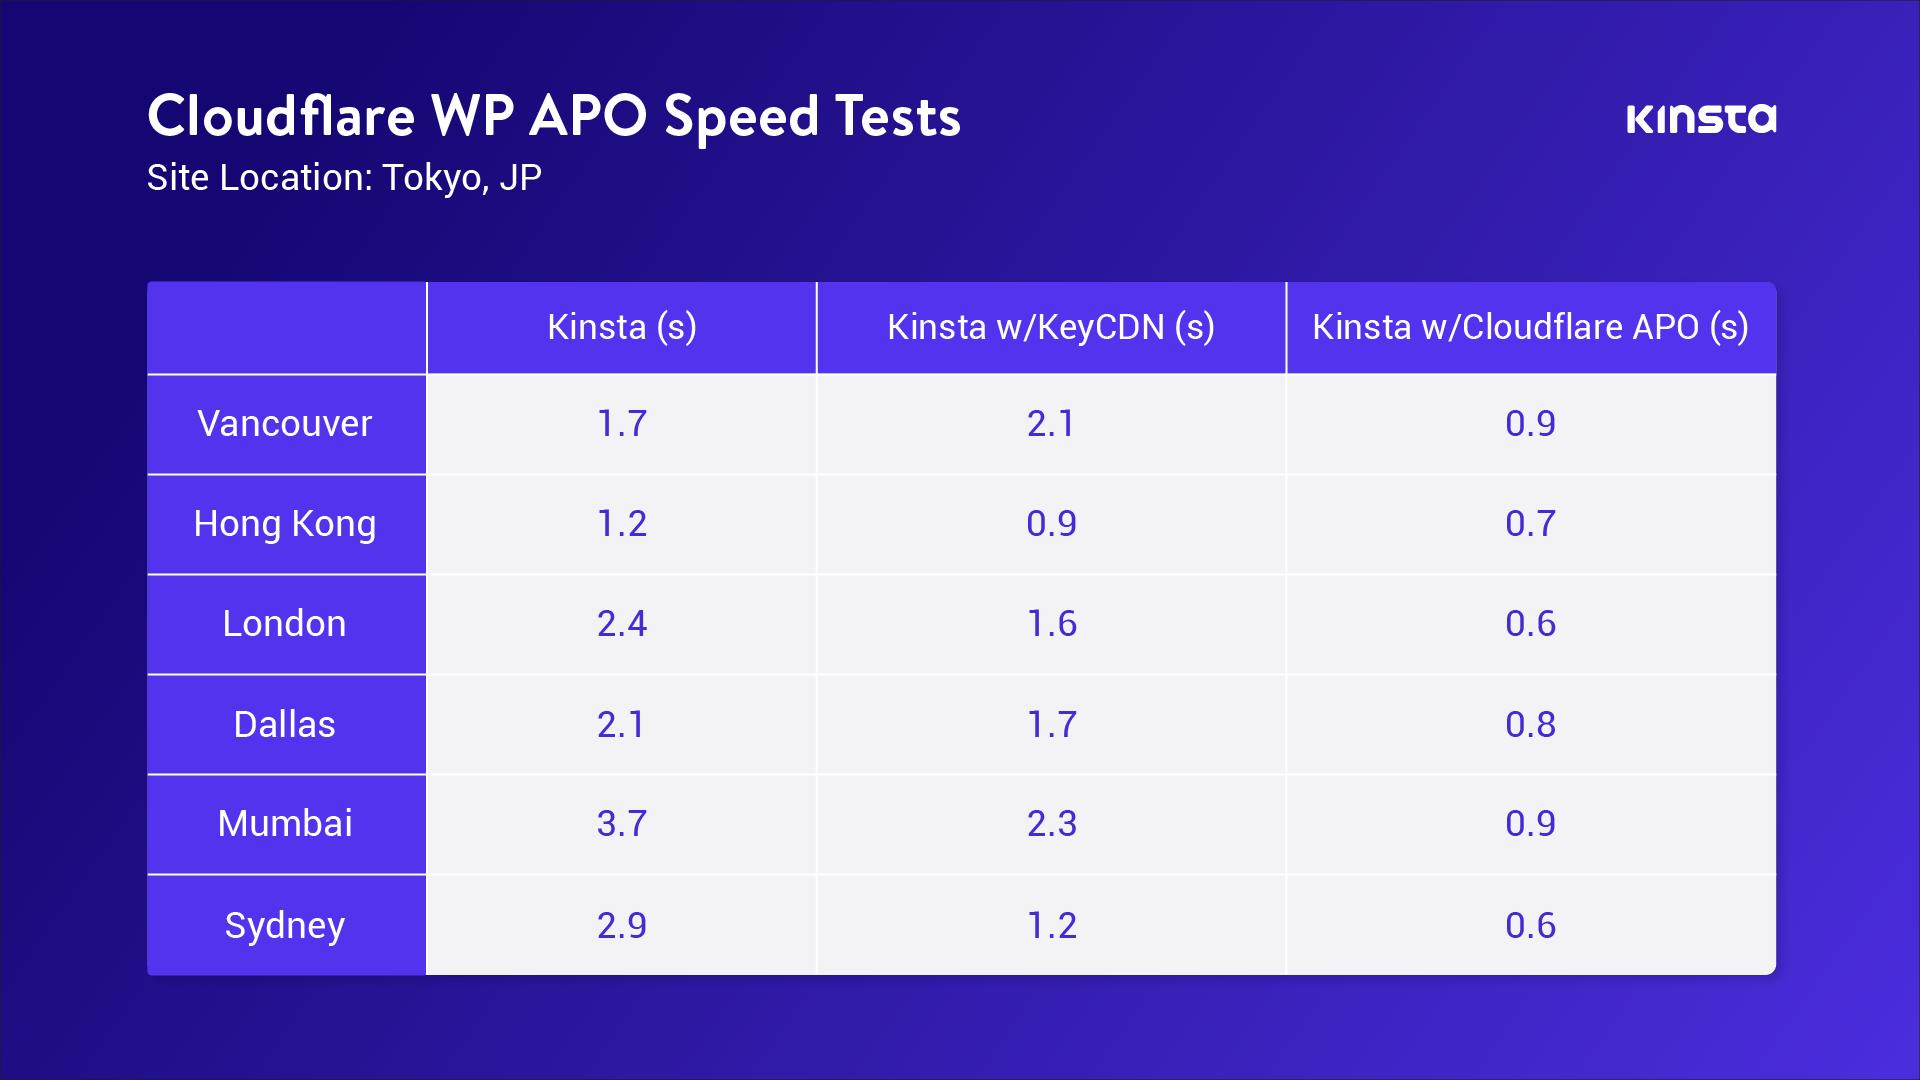 启用Cloudflare APO可将WordPress性能提高300%。